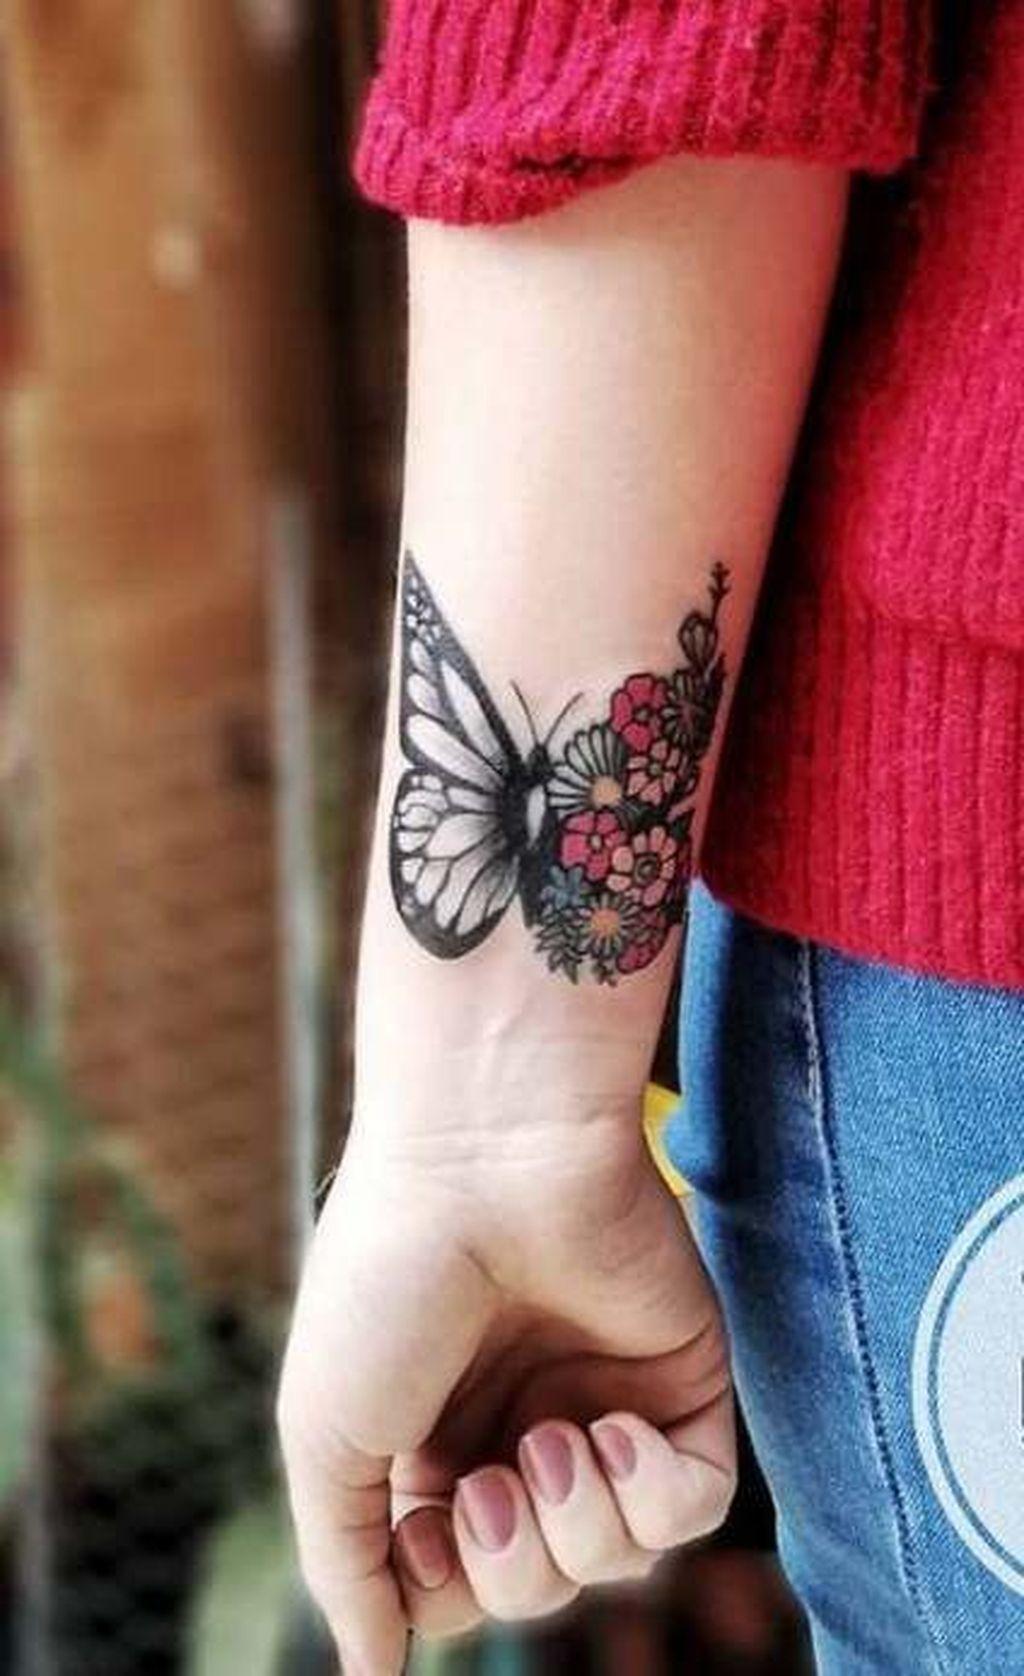 40 Wonderful Wrist Tattoos Ideas For Women To Try Asap In 2020